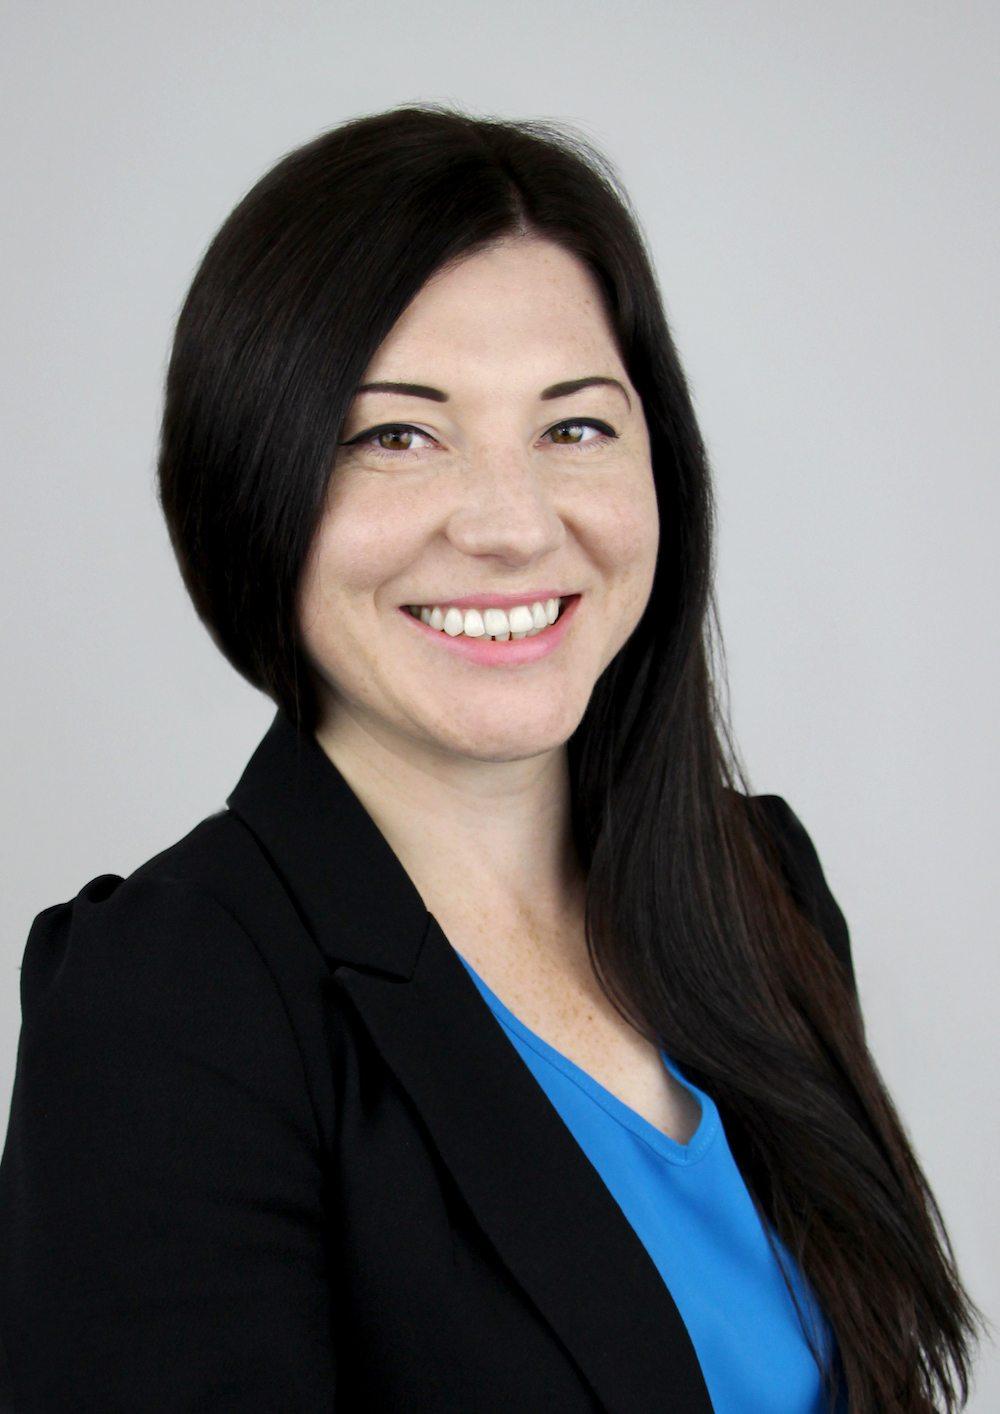 Joanna Berger